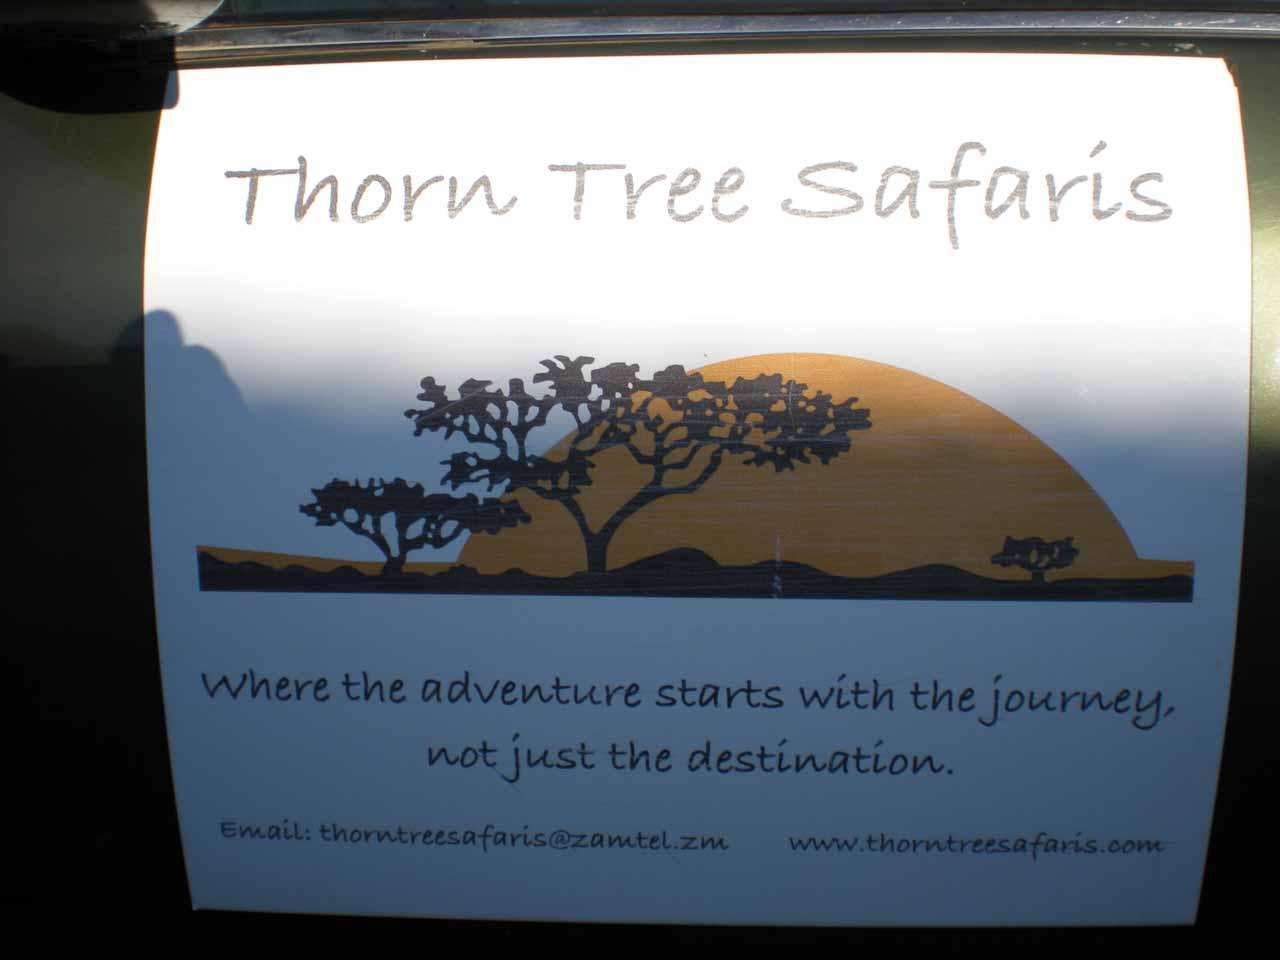 Thorn Tree Safaris